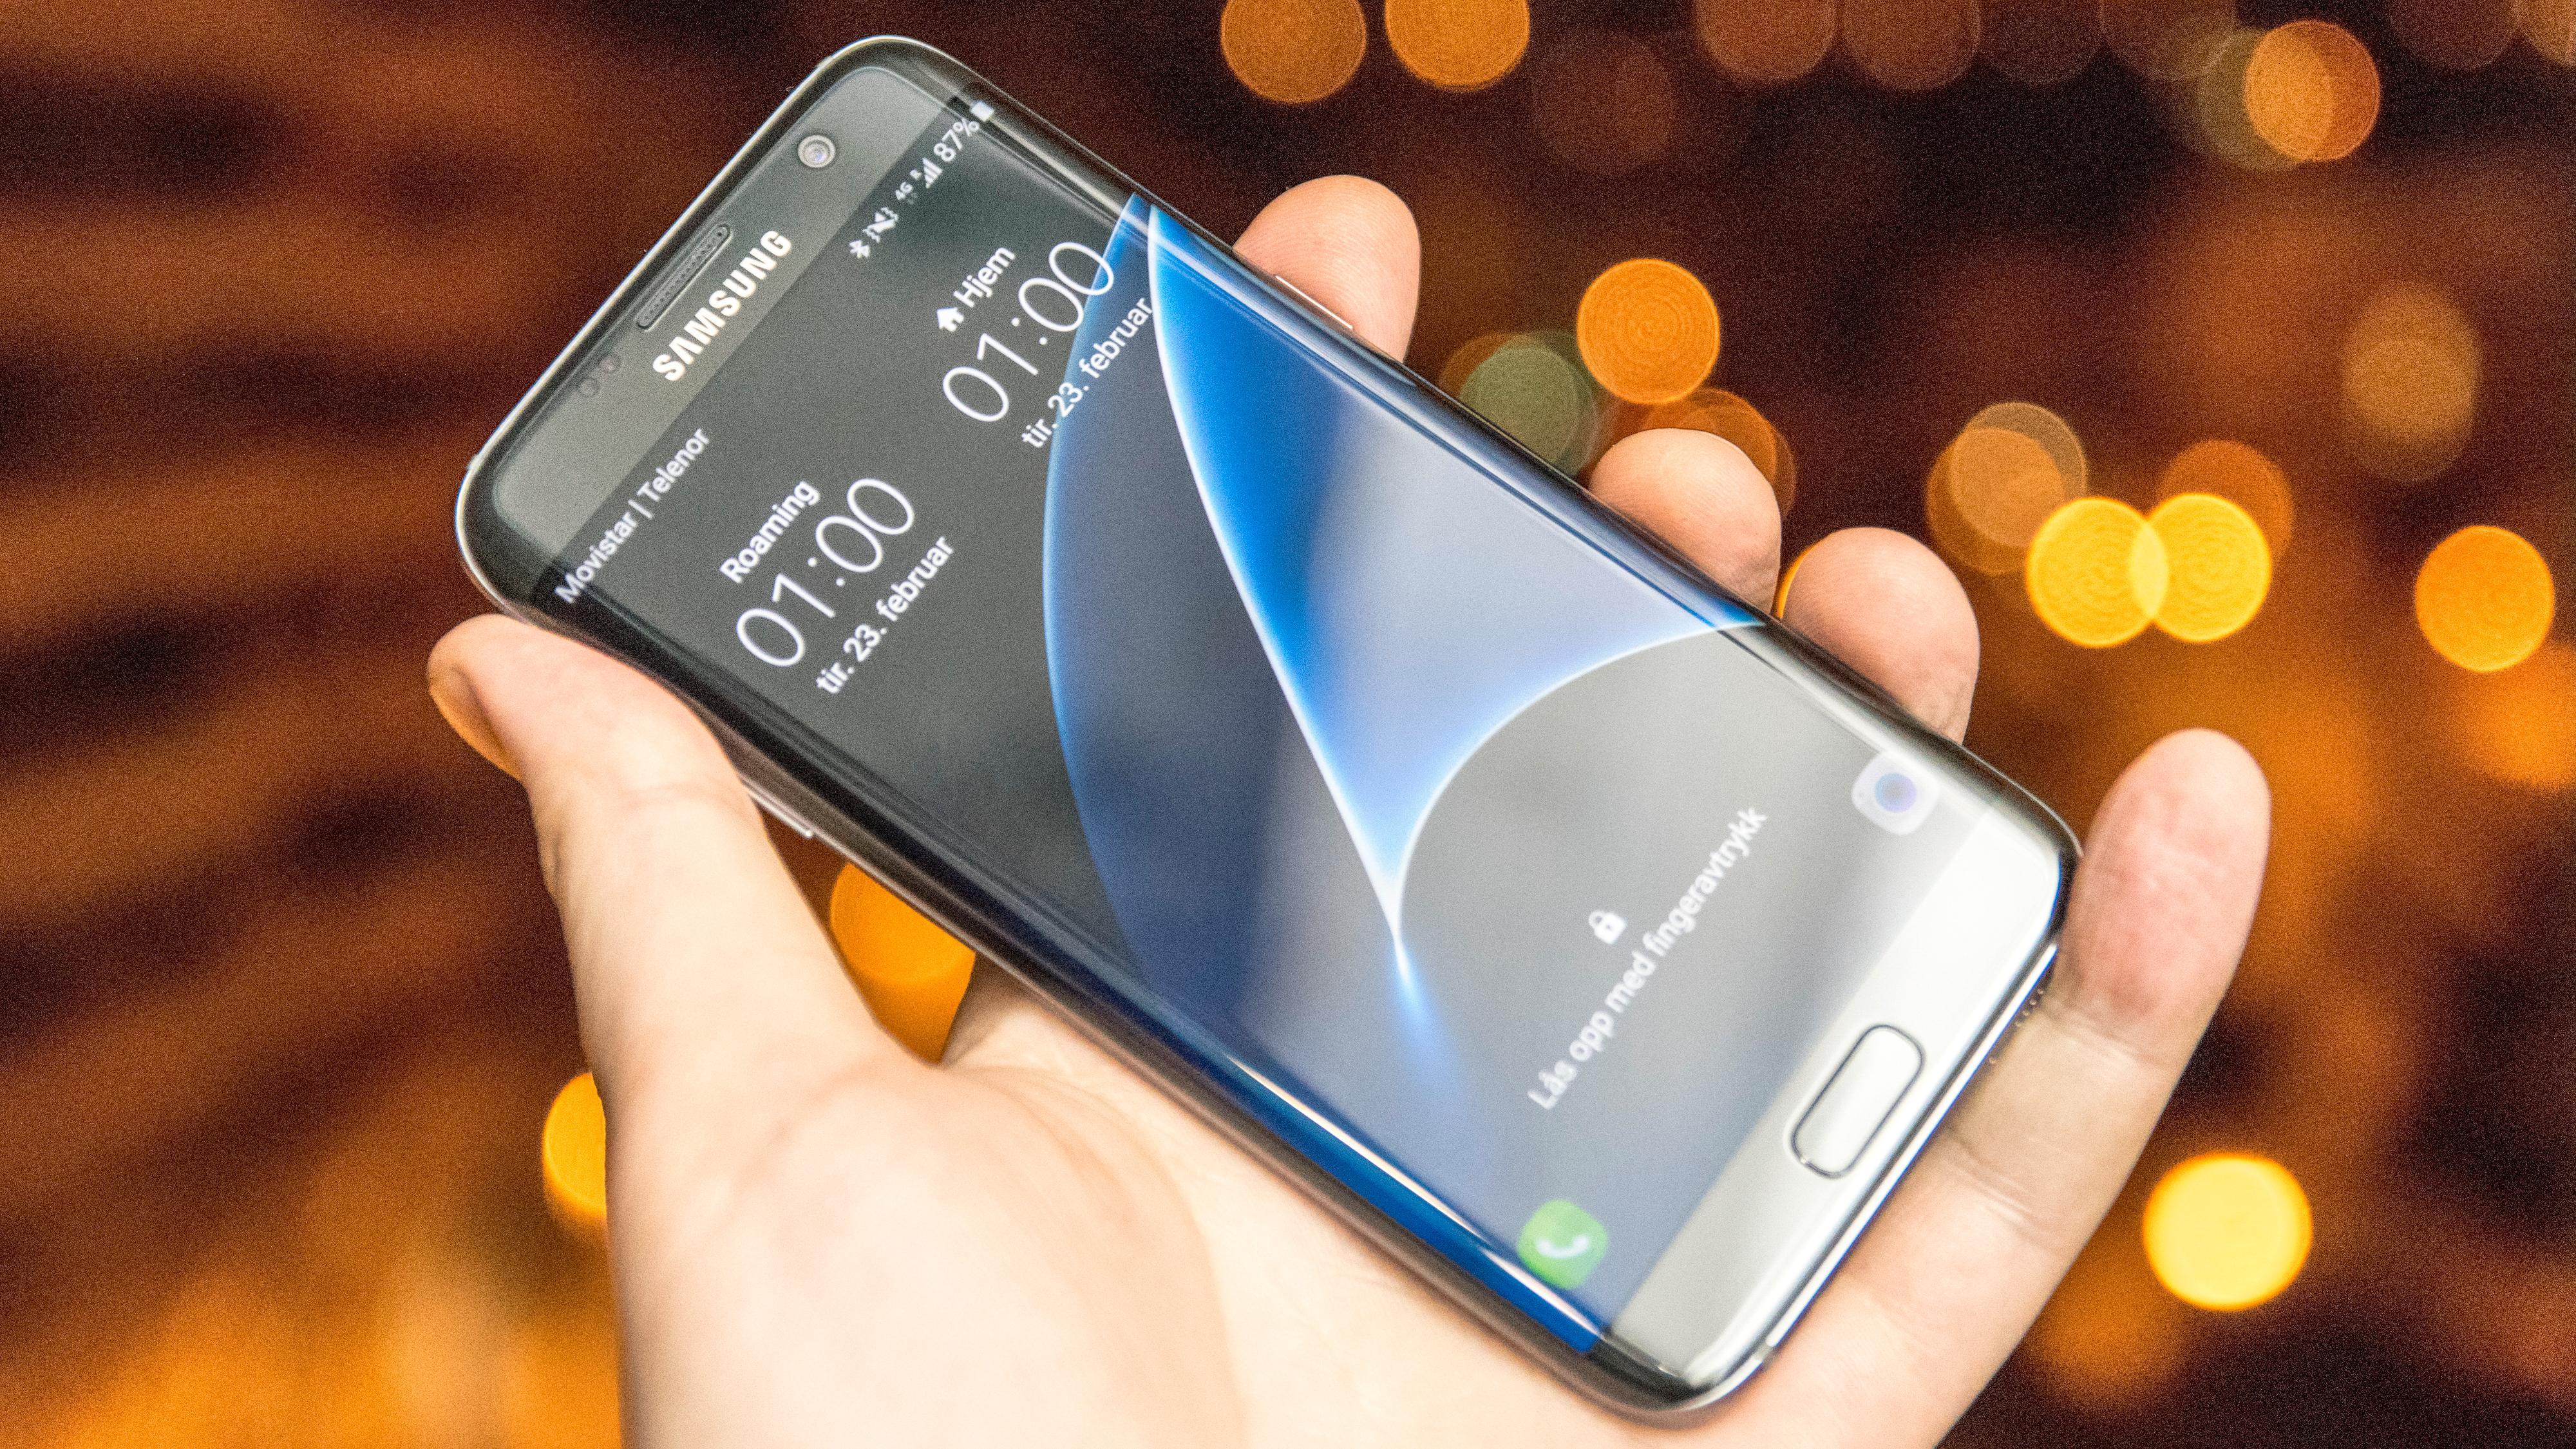 – Samsung Galaxy S8 skal droppe hodetelefoninngangen